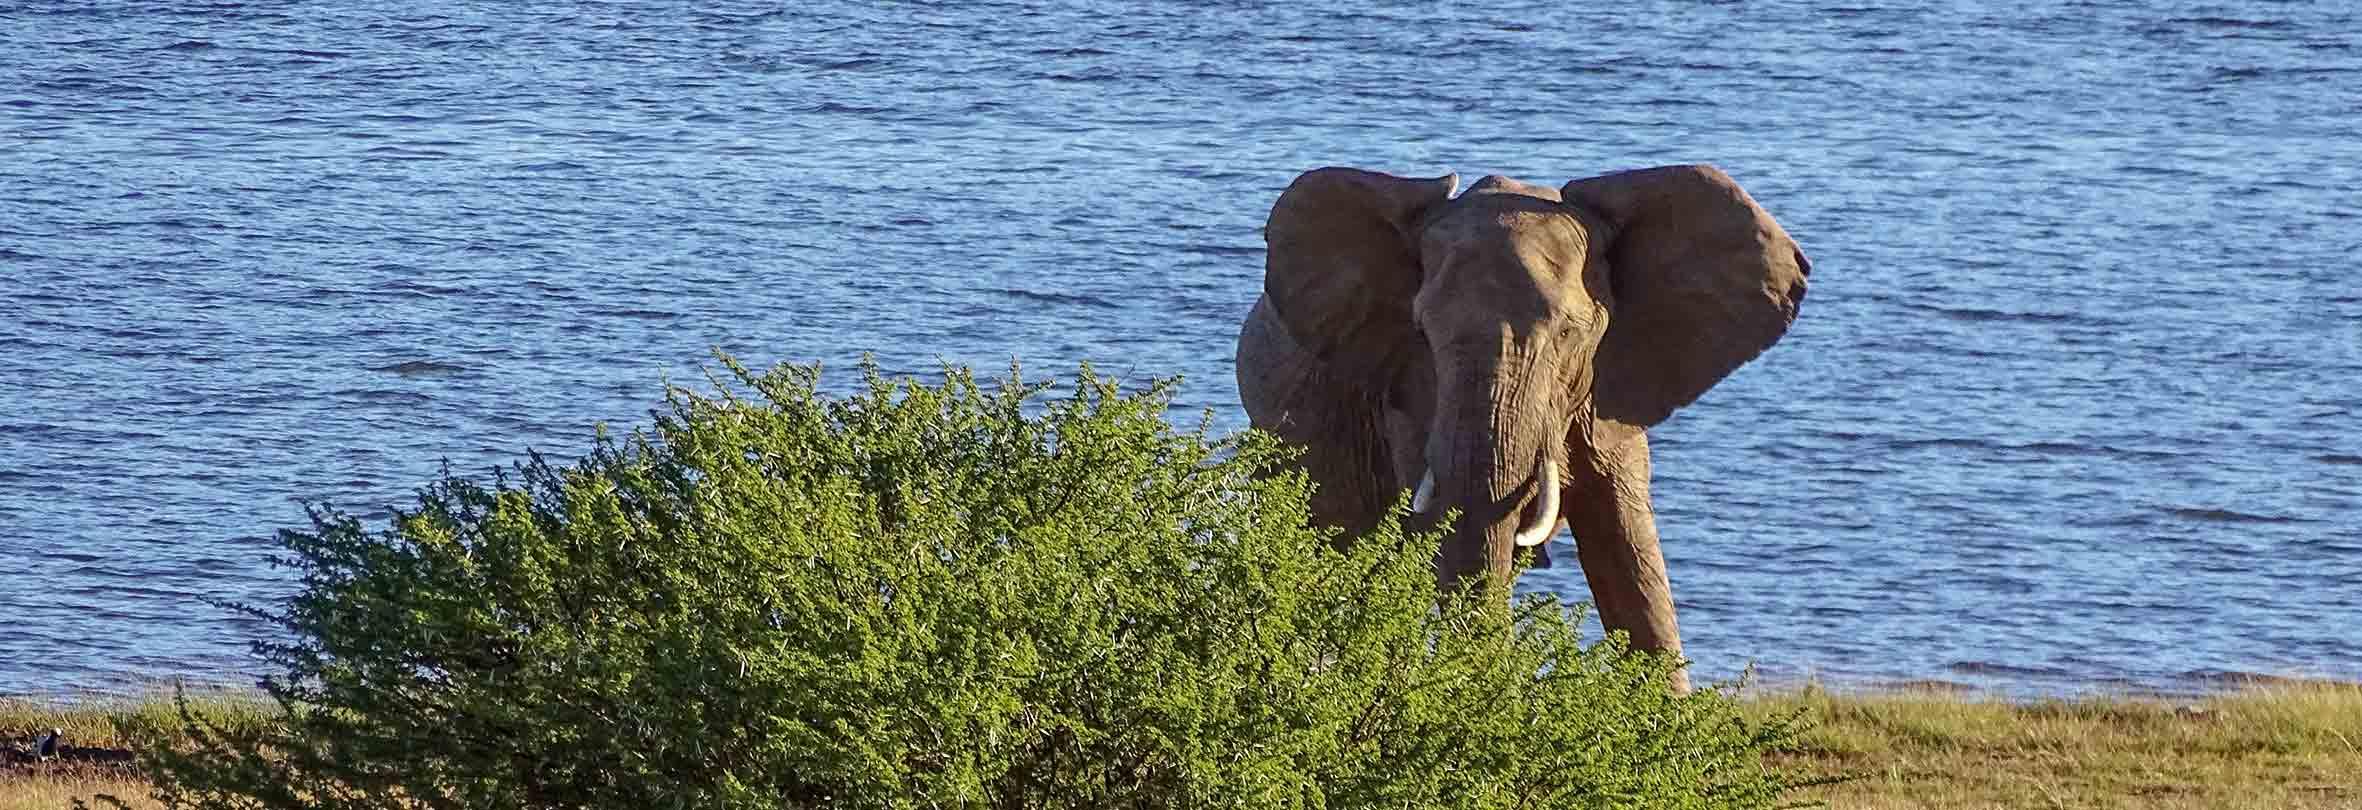 Elefant im Pilanesberg-Nationalpark, Südafrika